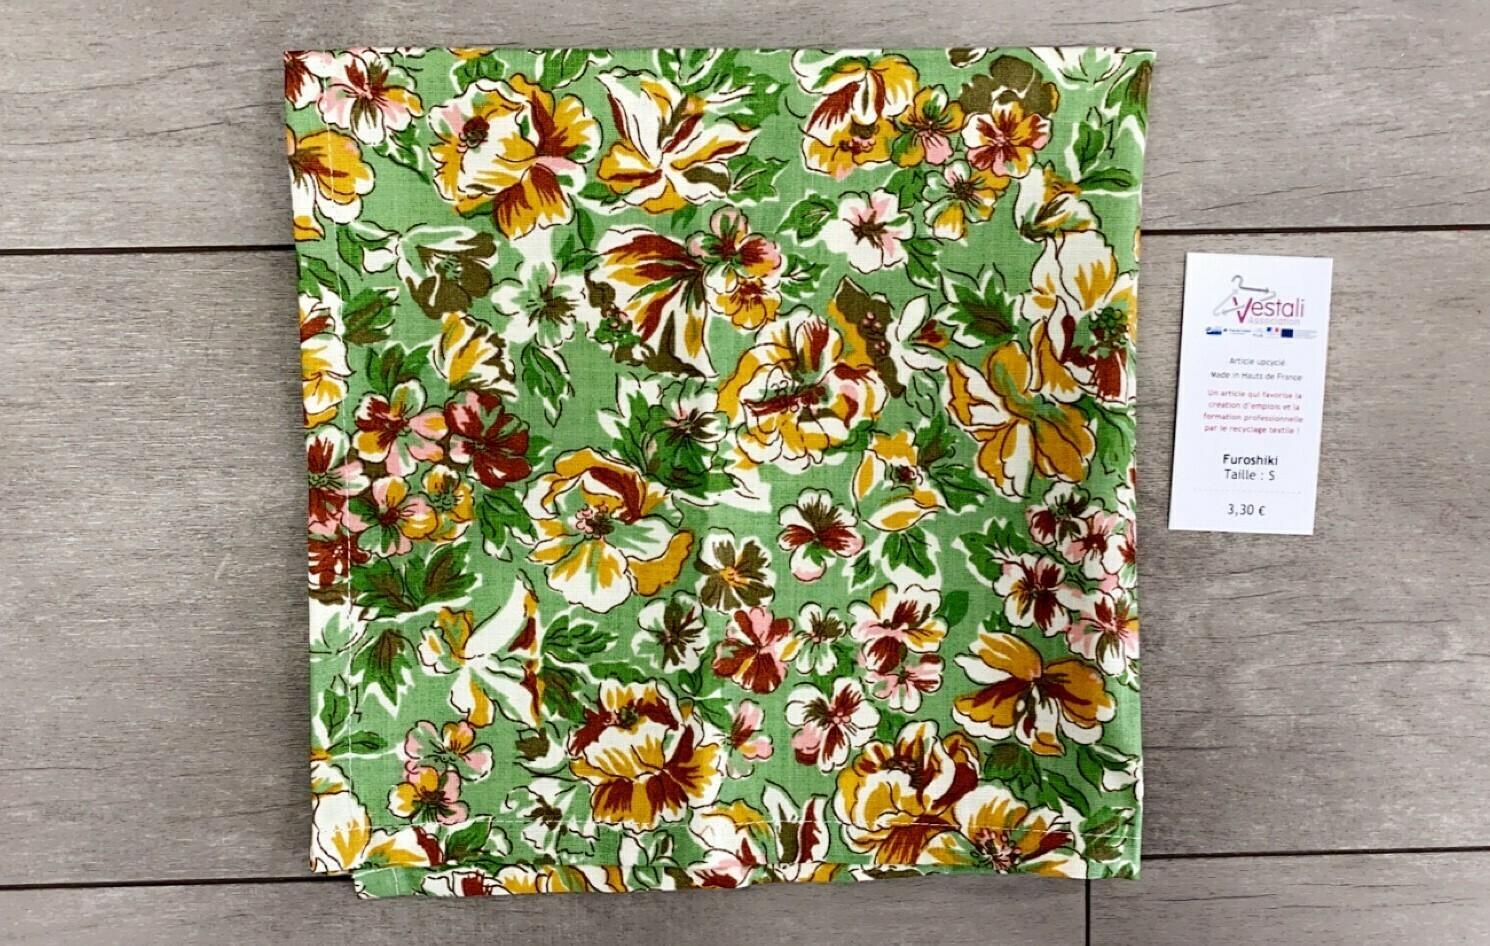 Furoshiki - Taille M - Vert à Fleurs